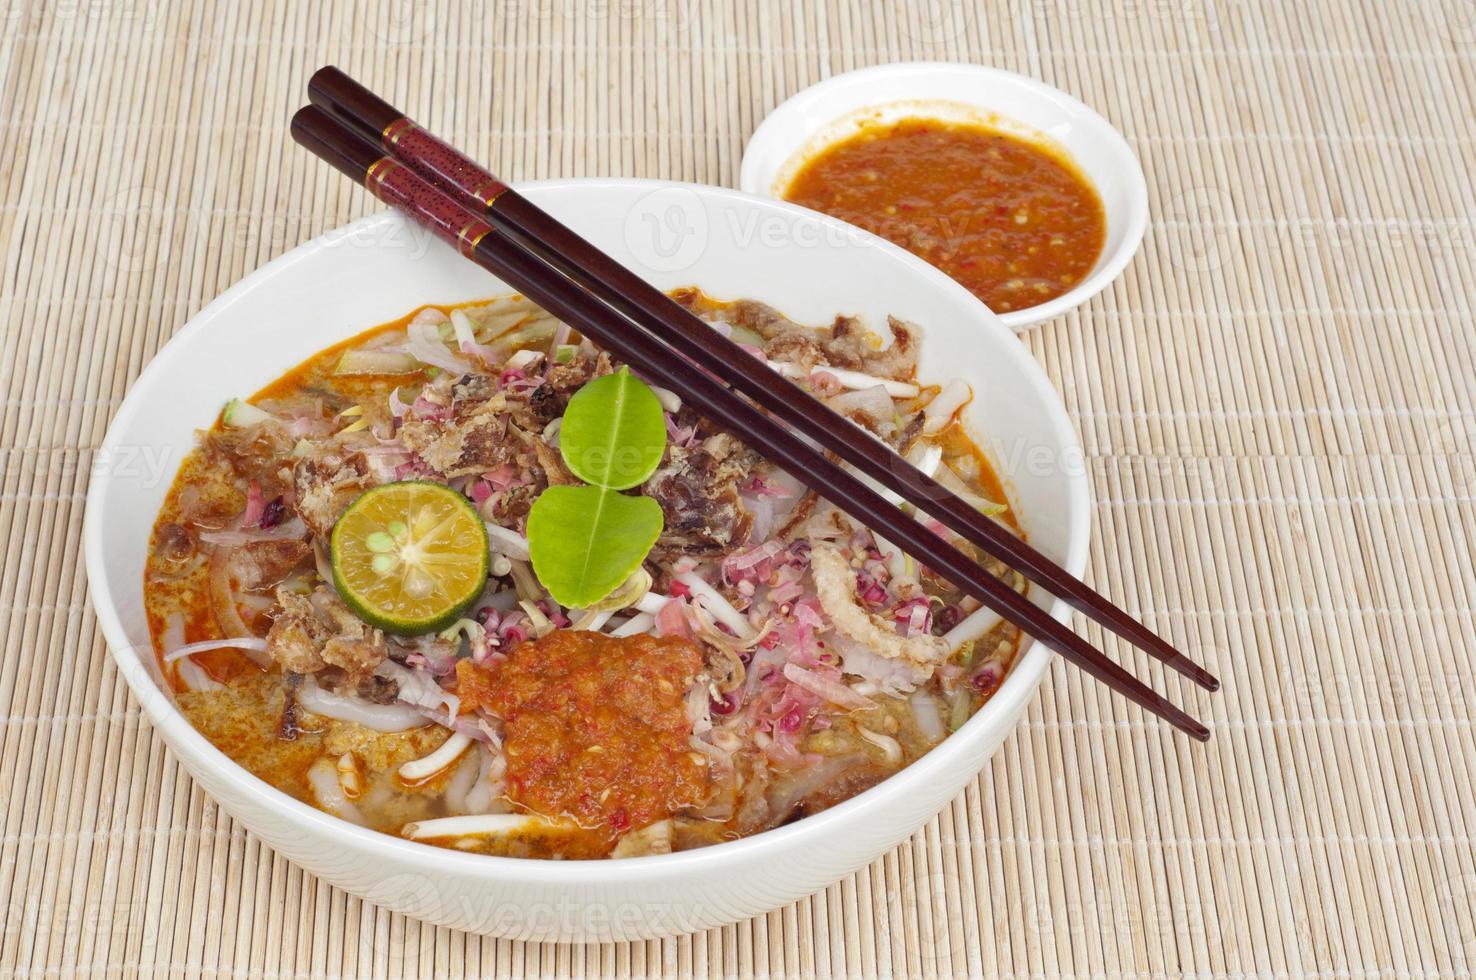 cuisine asiatique: johor laksa photo